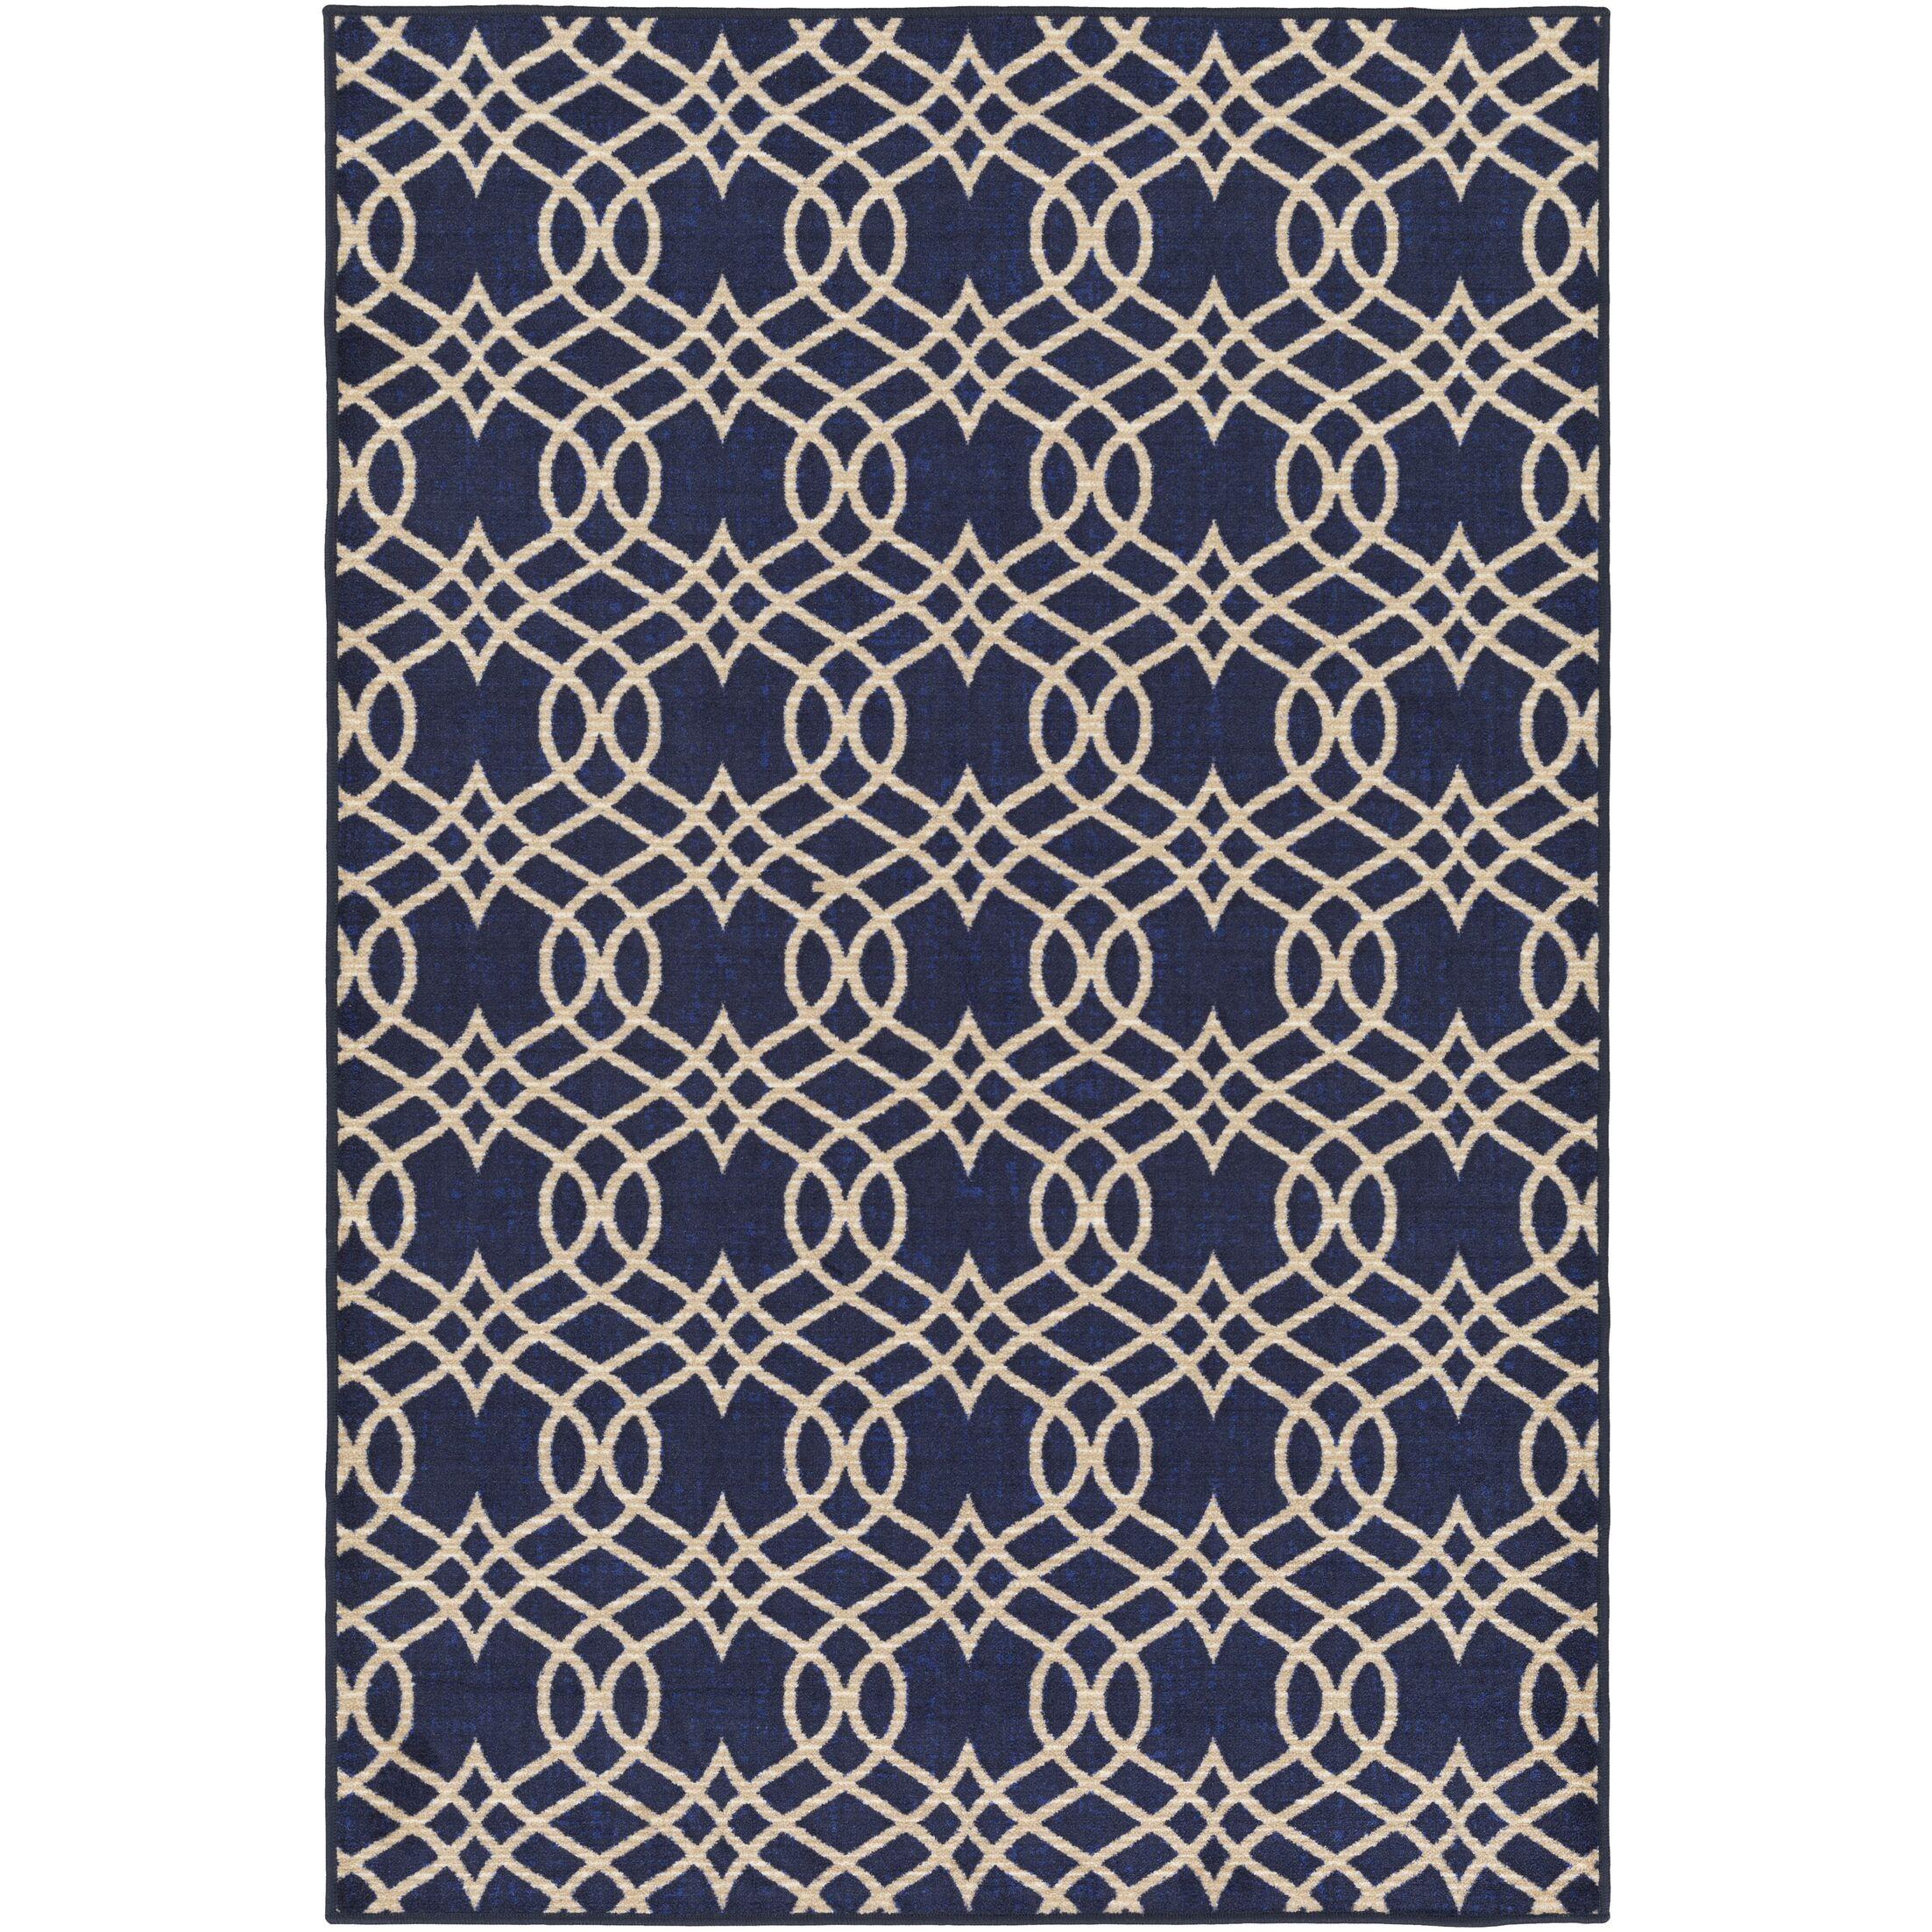 Hardenburgh Blue/Beige Area Rug Rug Size: Rectangle 5' x 8'